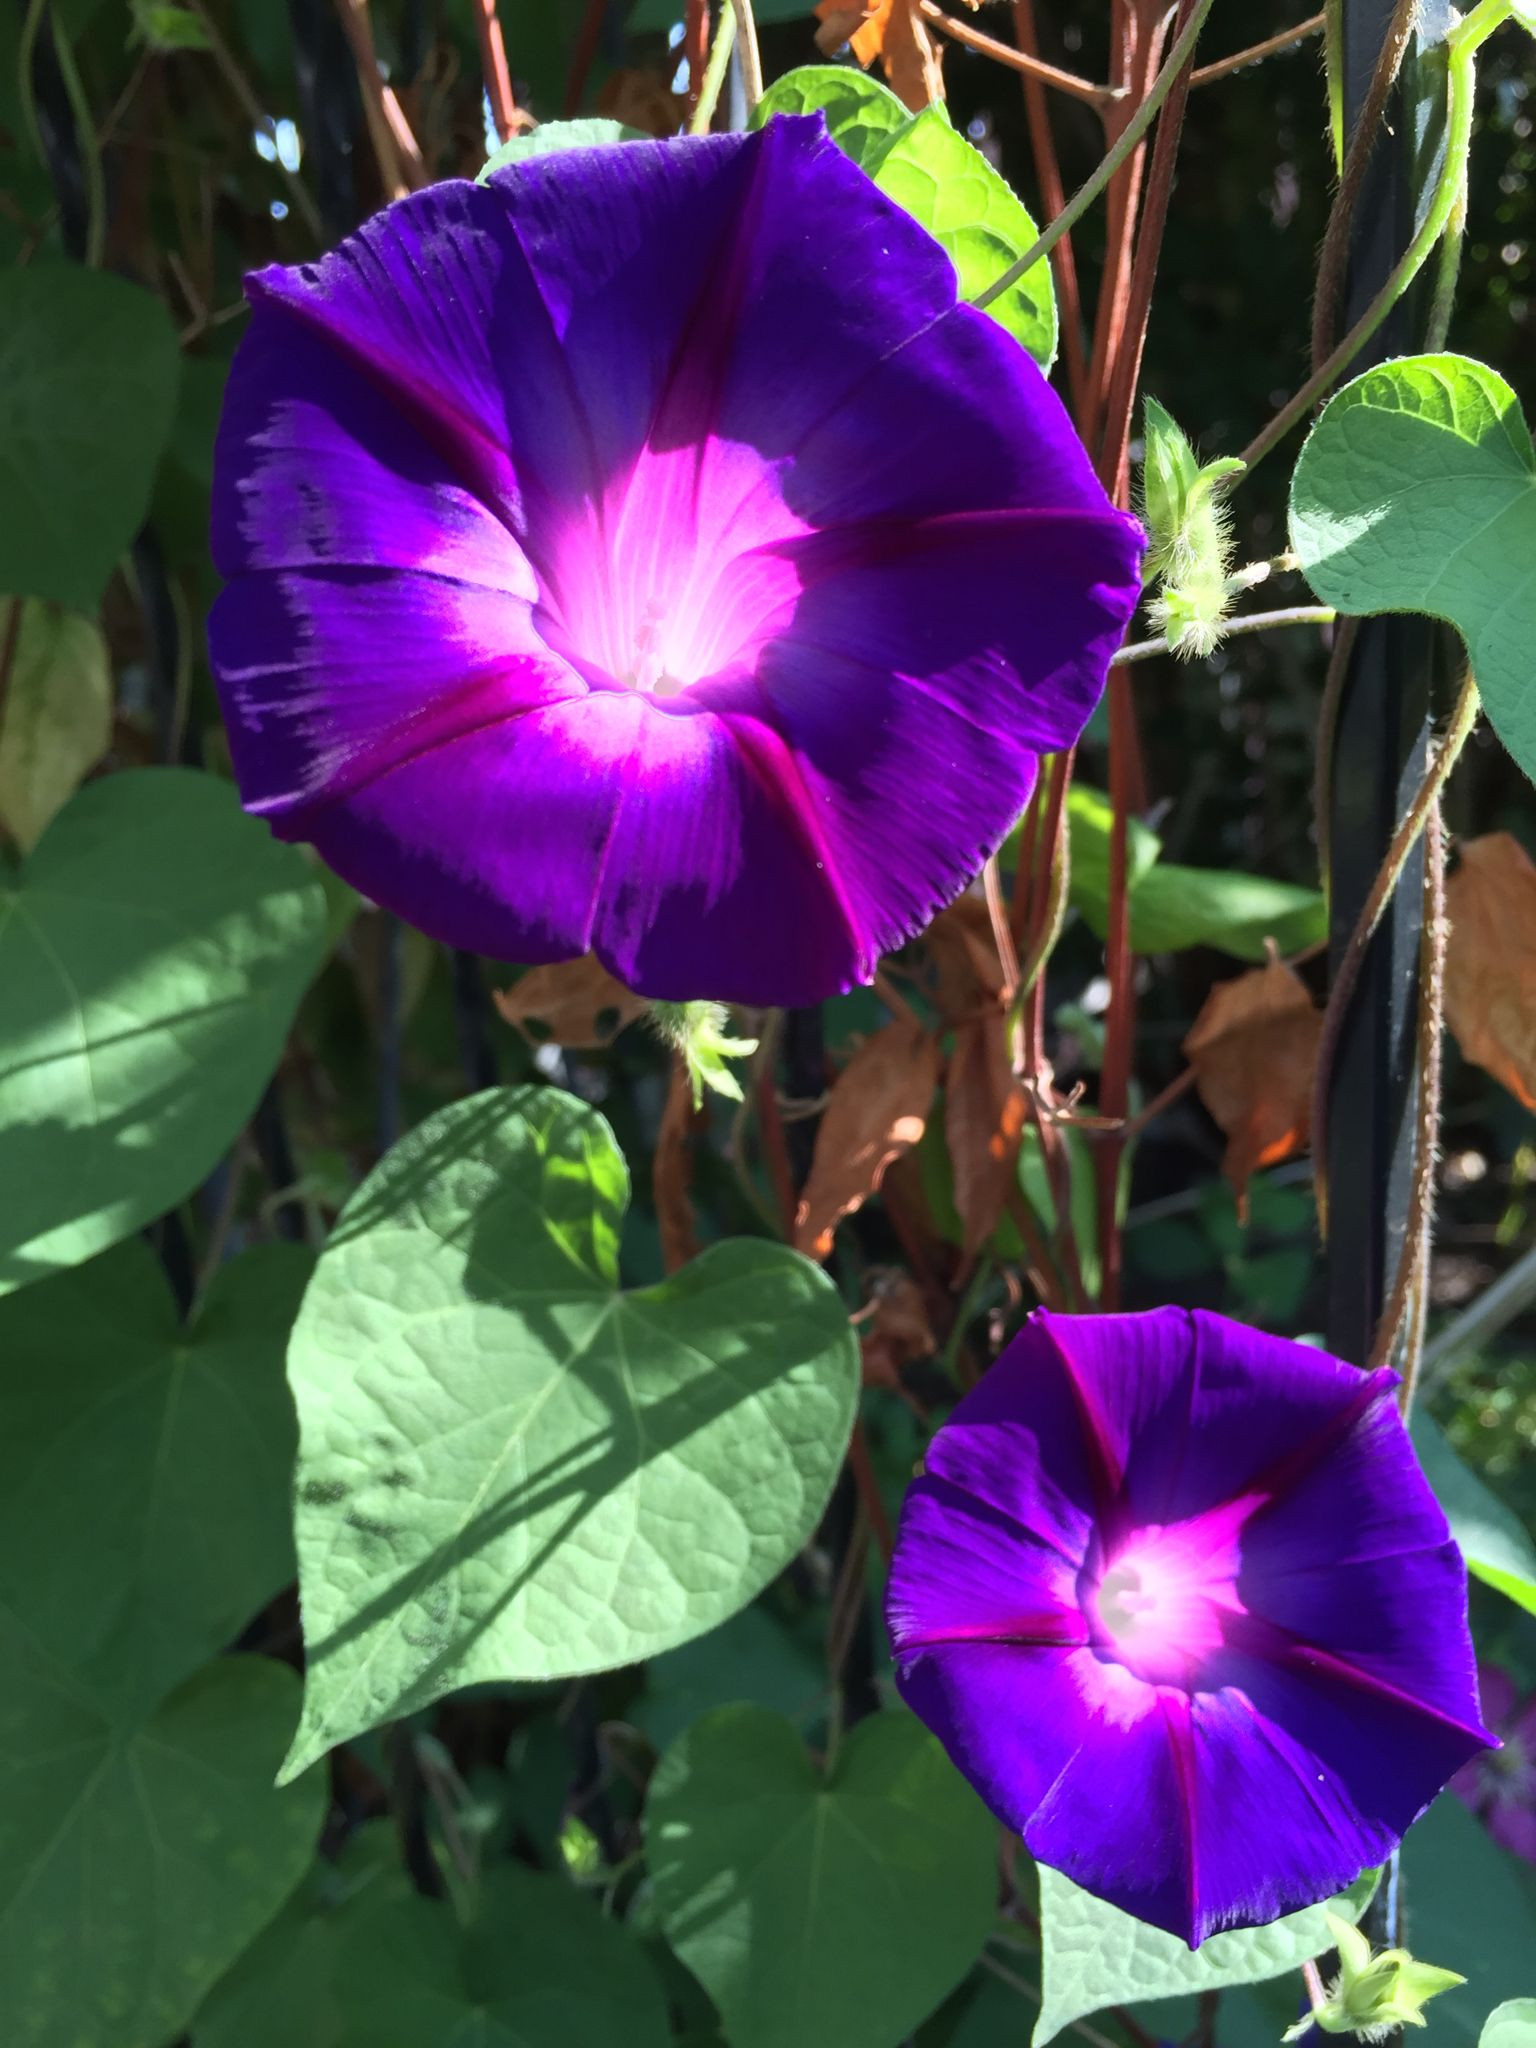 Morning Glories by Hamlin Grange morningglories flowers garden gardenphotography purpleflowers